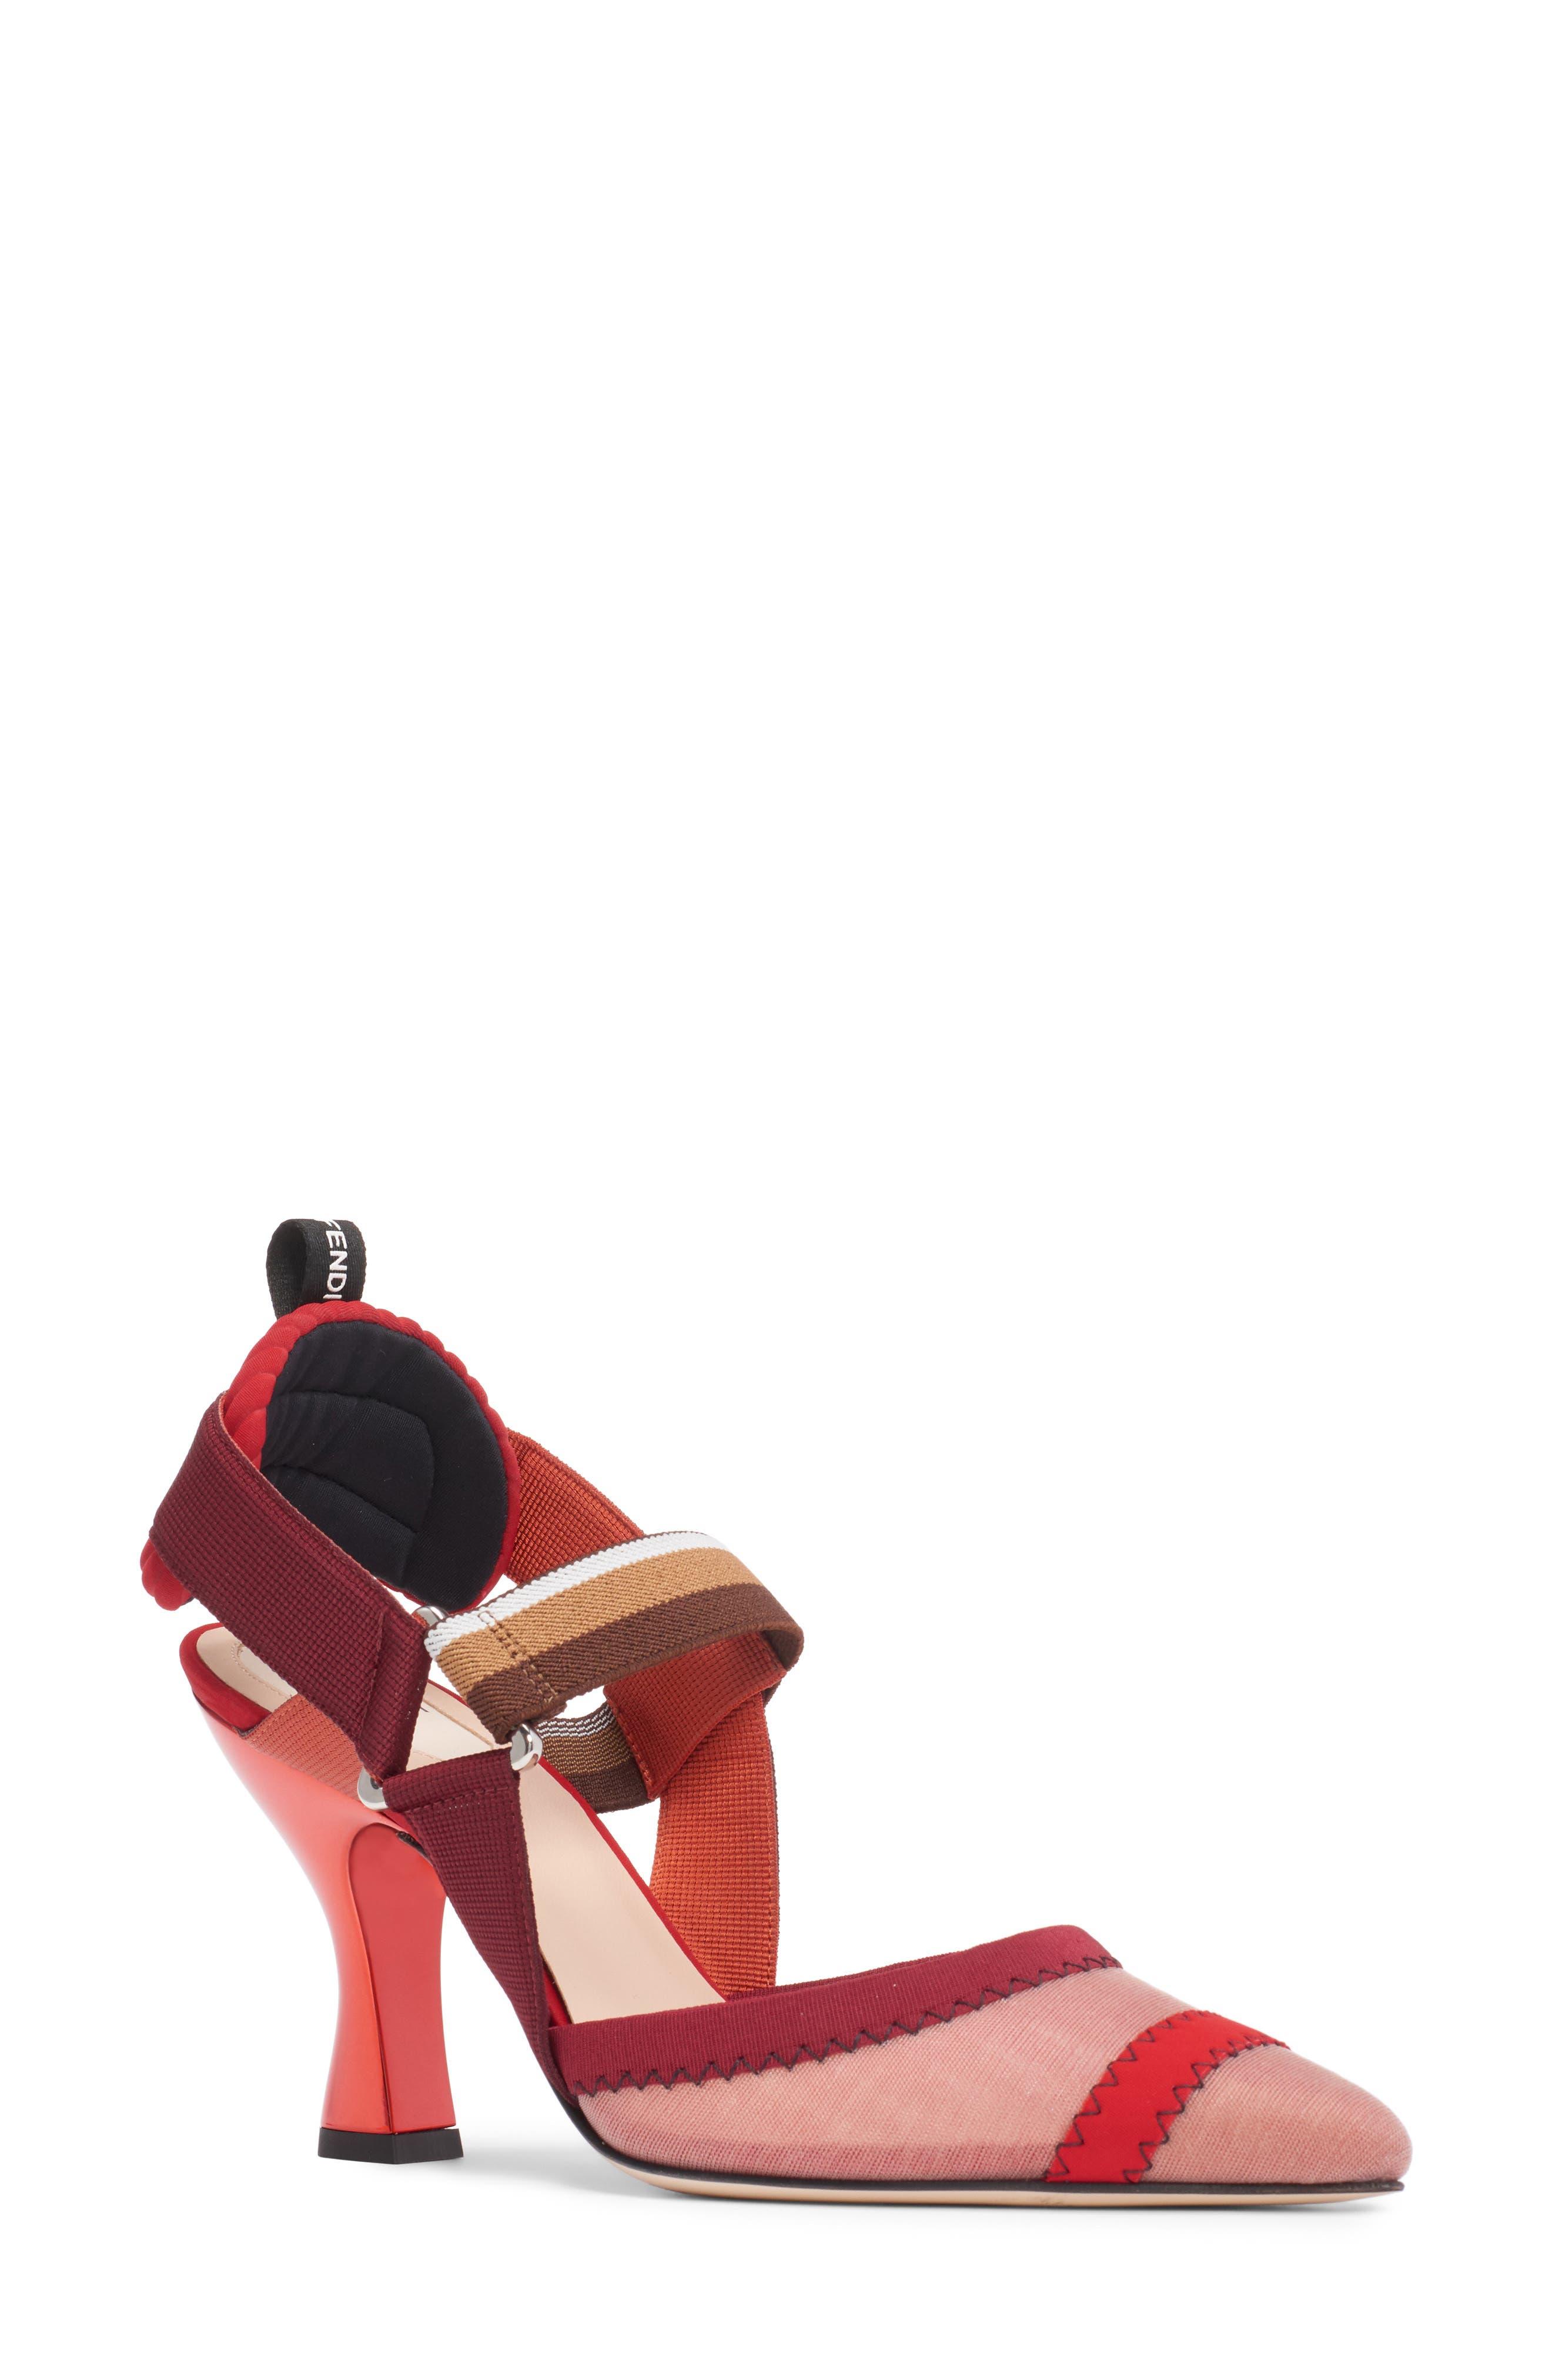 Fendi Colibri Mesh Slingback Pump - Red